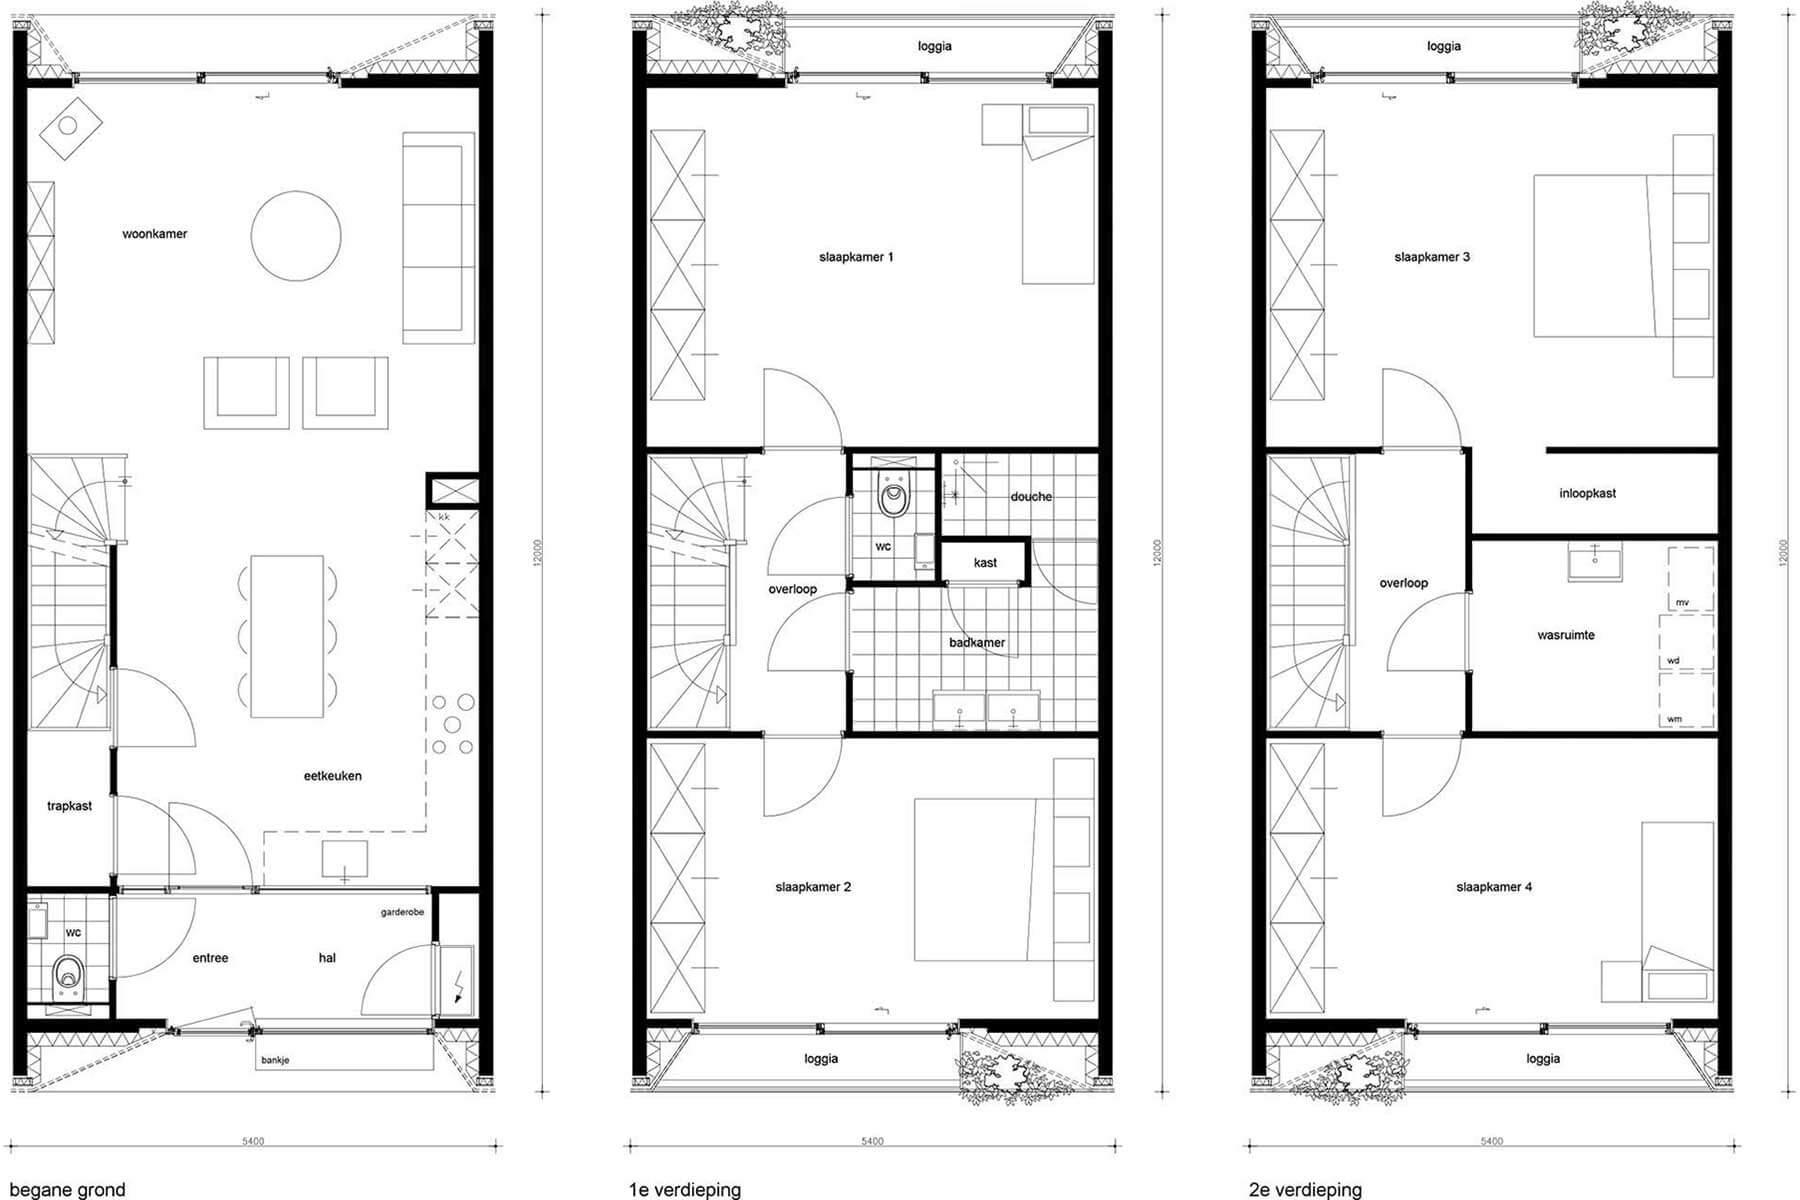 8A-Architecten-loggia-house-amsterdam-ijburg-04